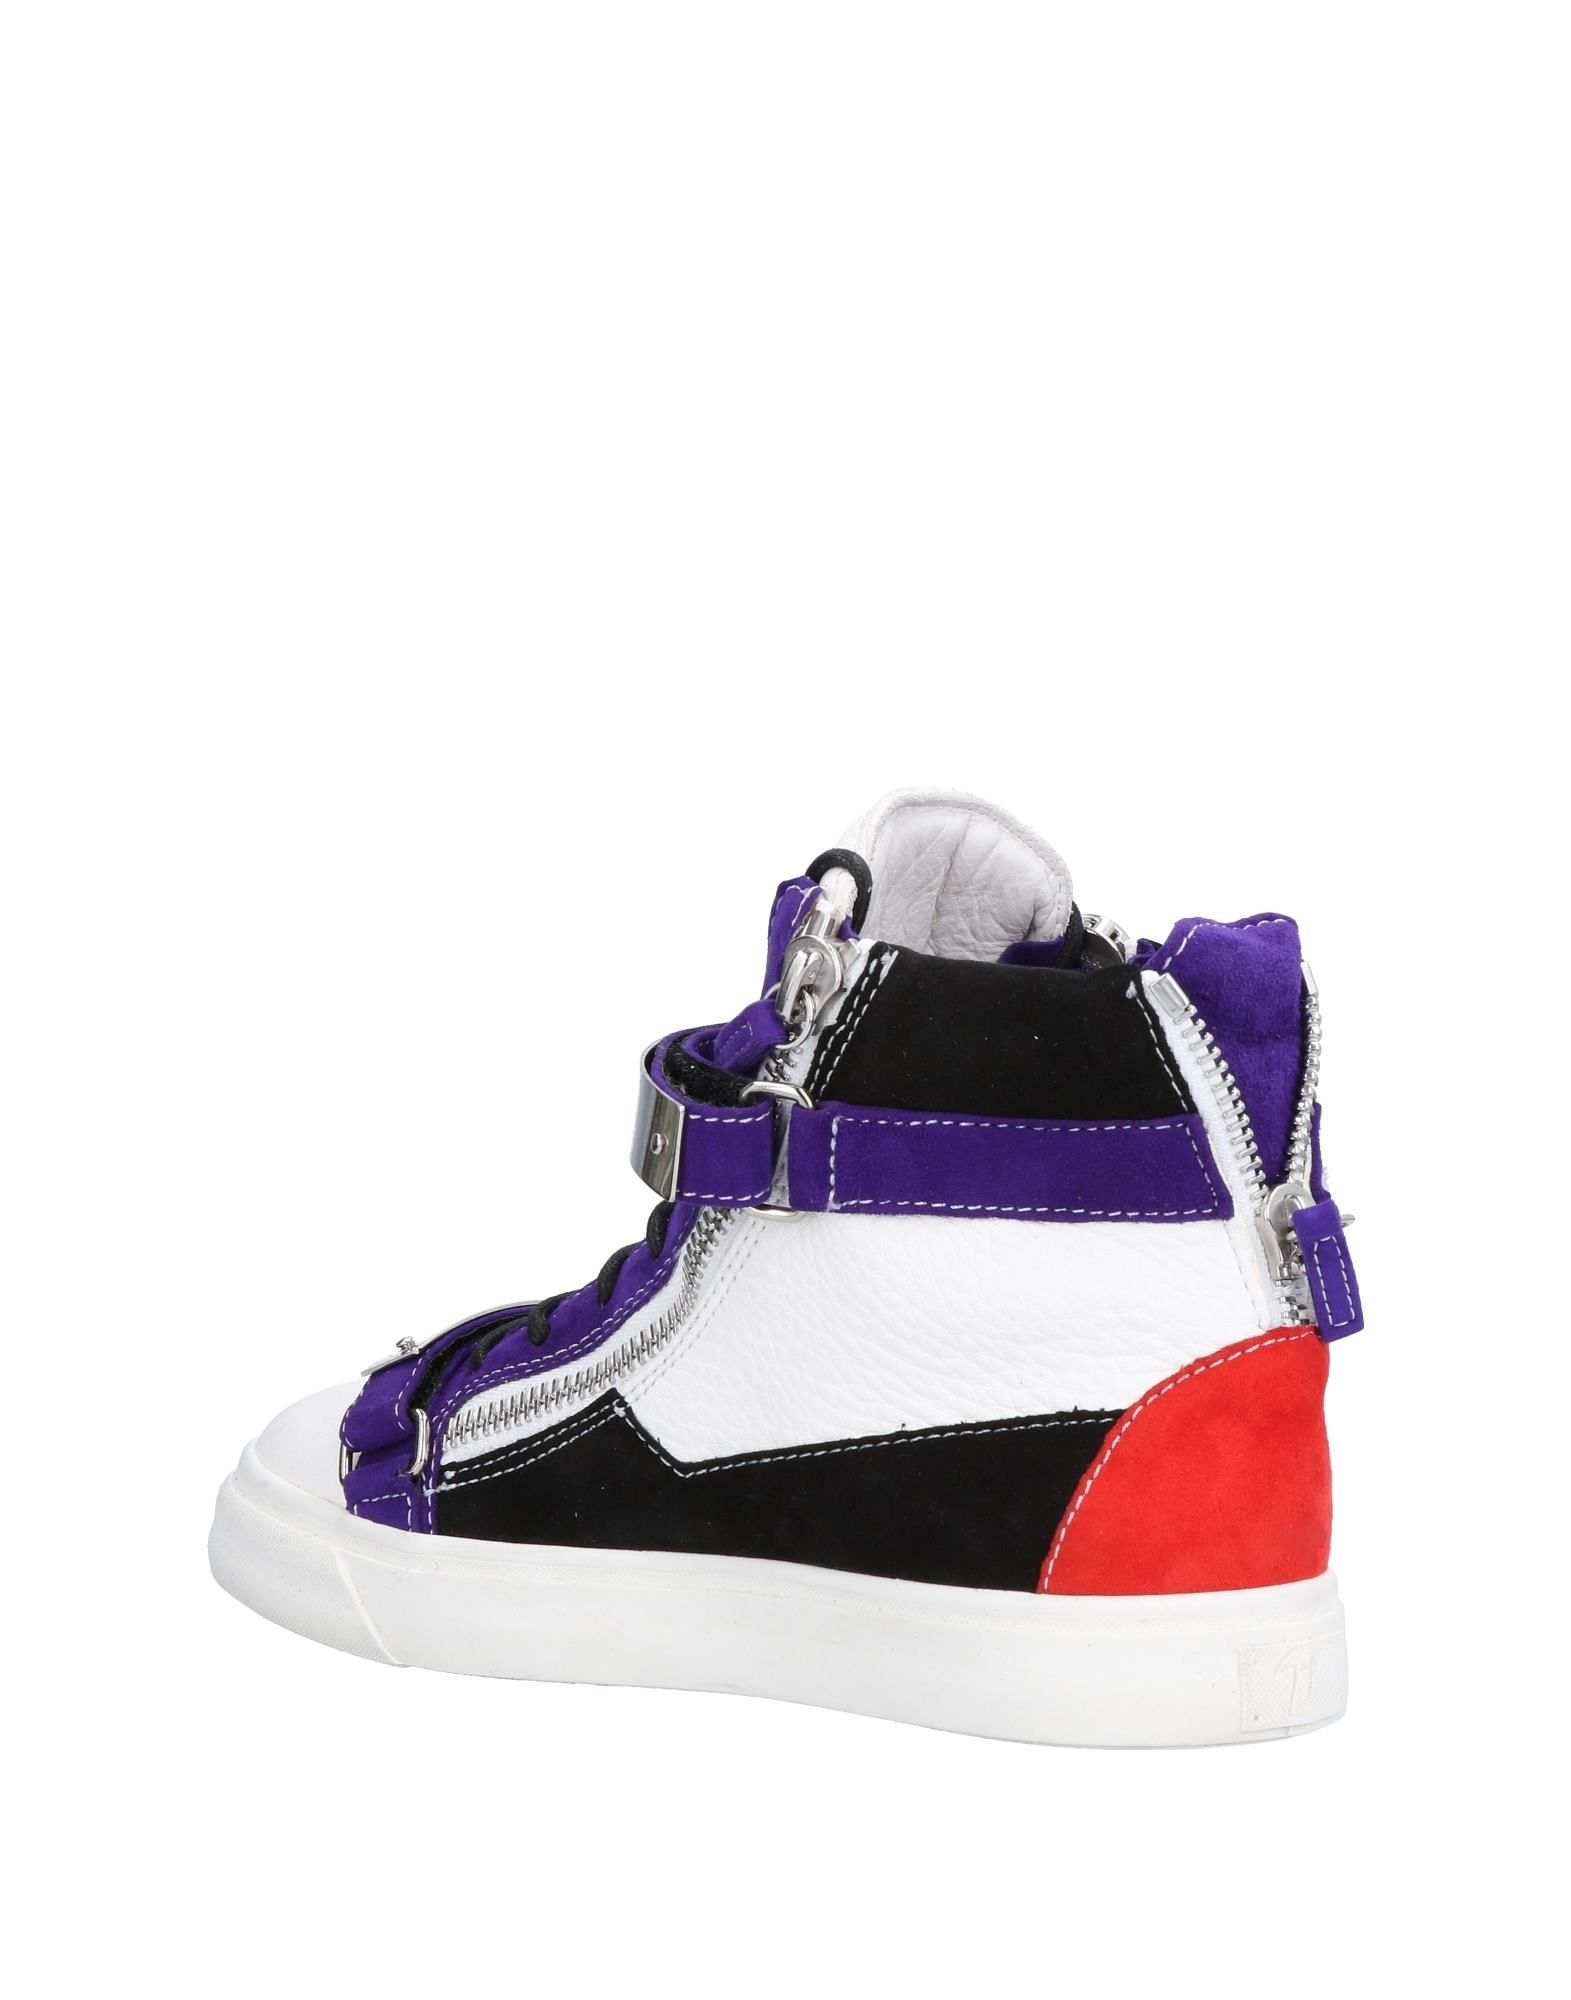 Giuseppe Zanotti gut Sneakers Damen  11500040UJGünstige gut Zanotti aussehende Schuhe 0597bc